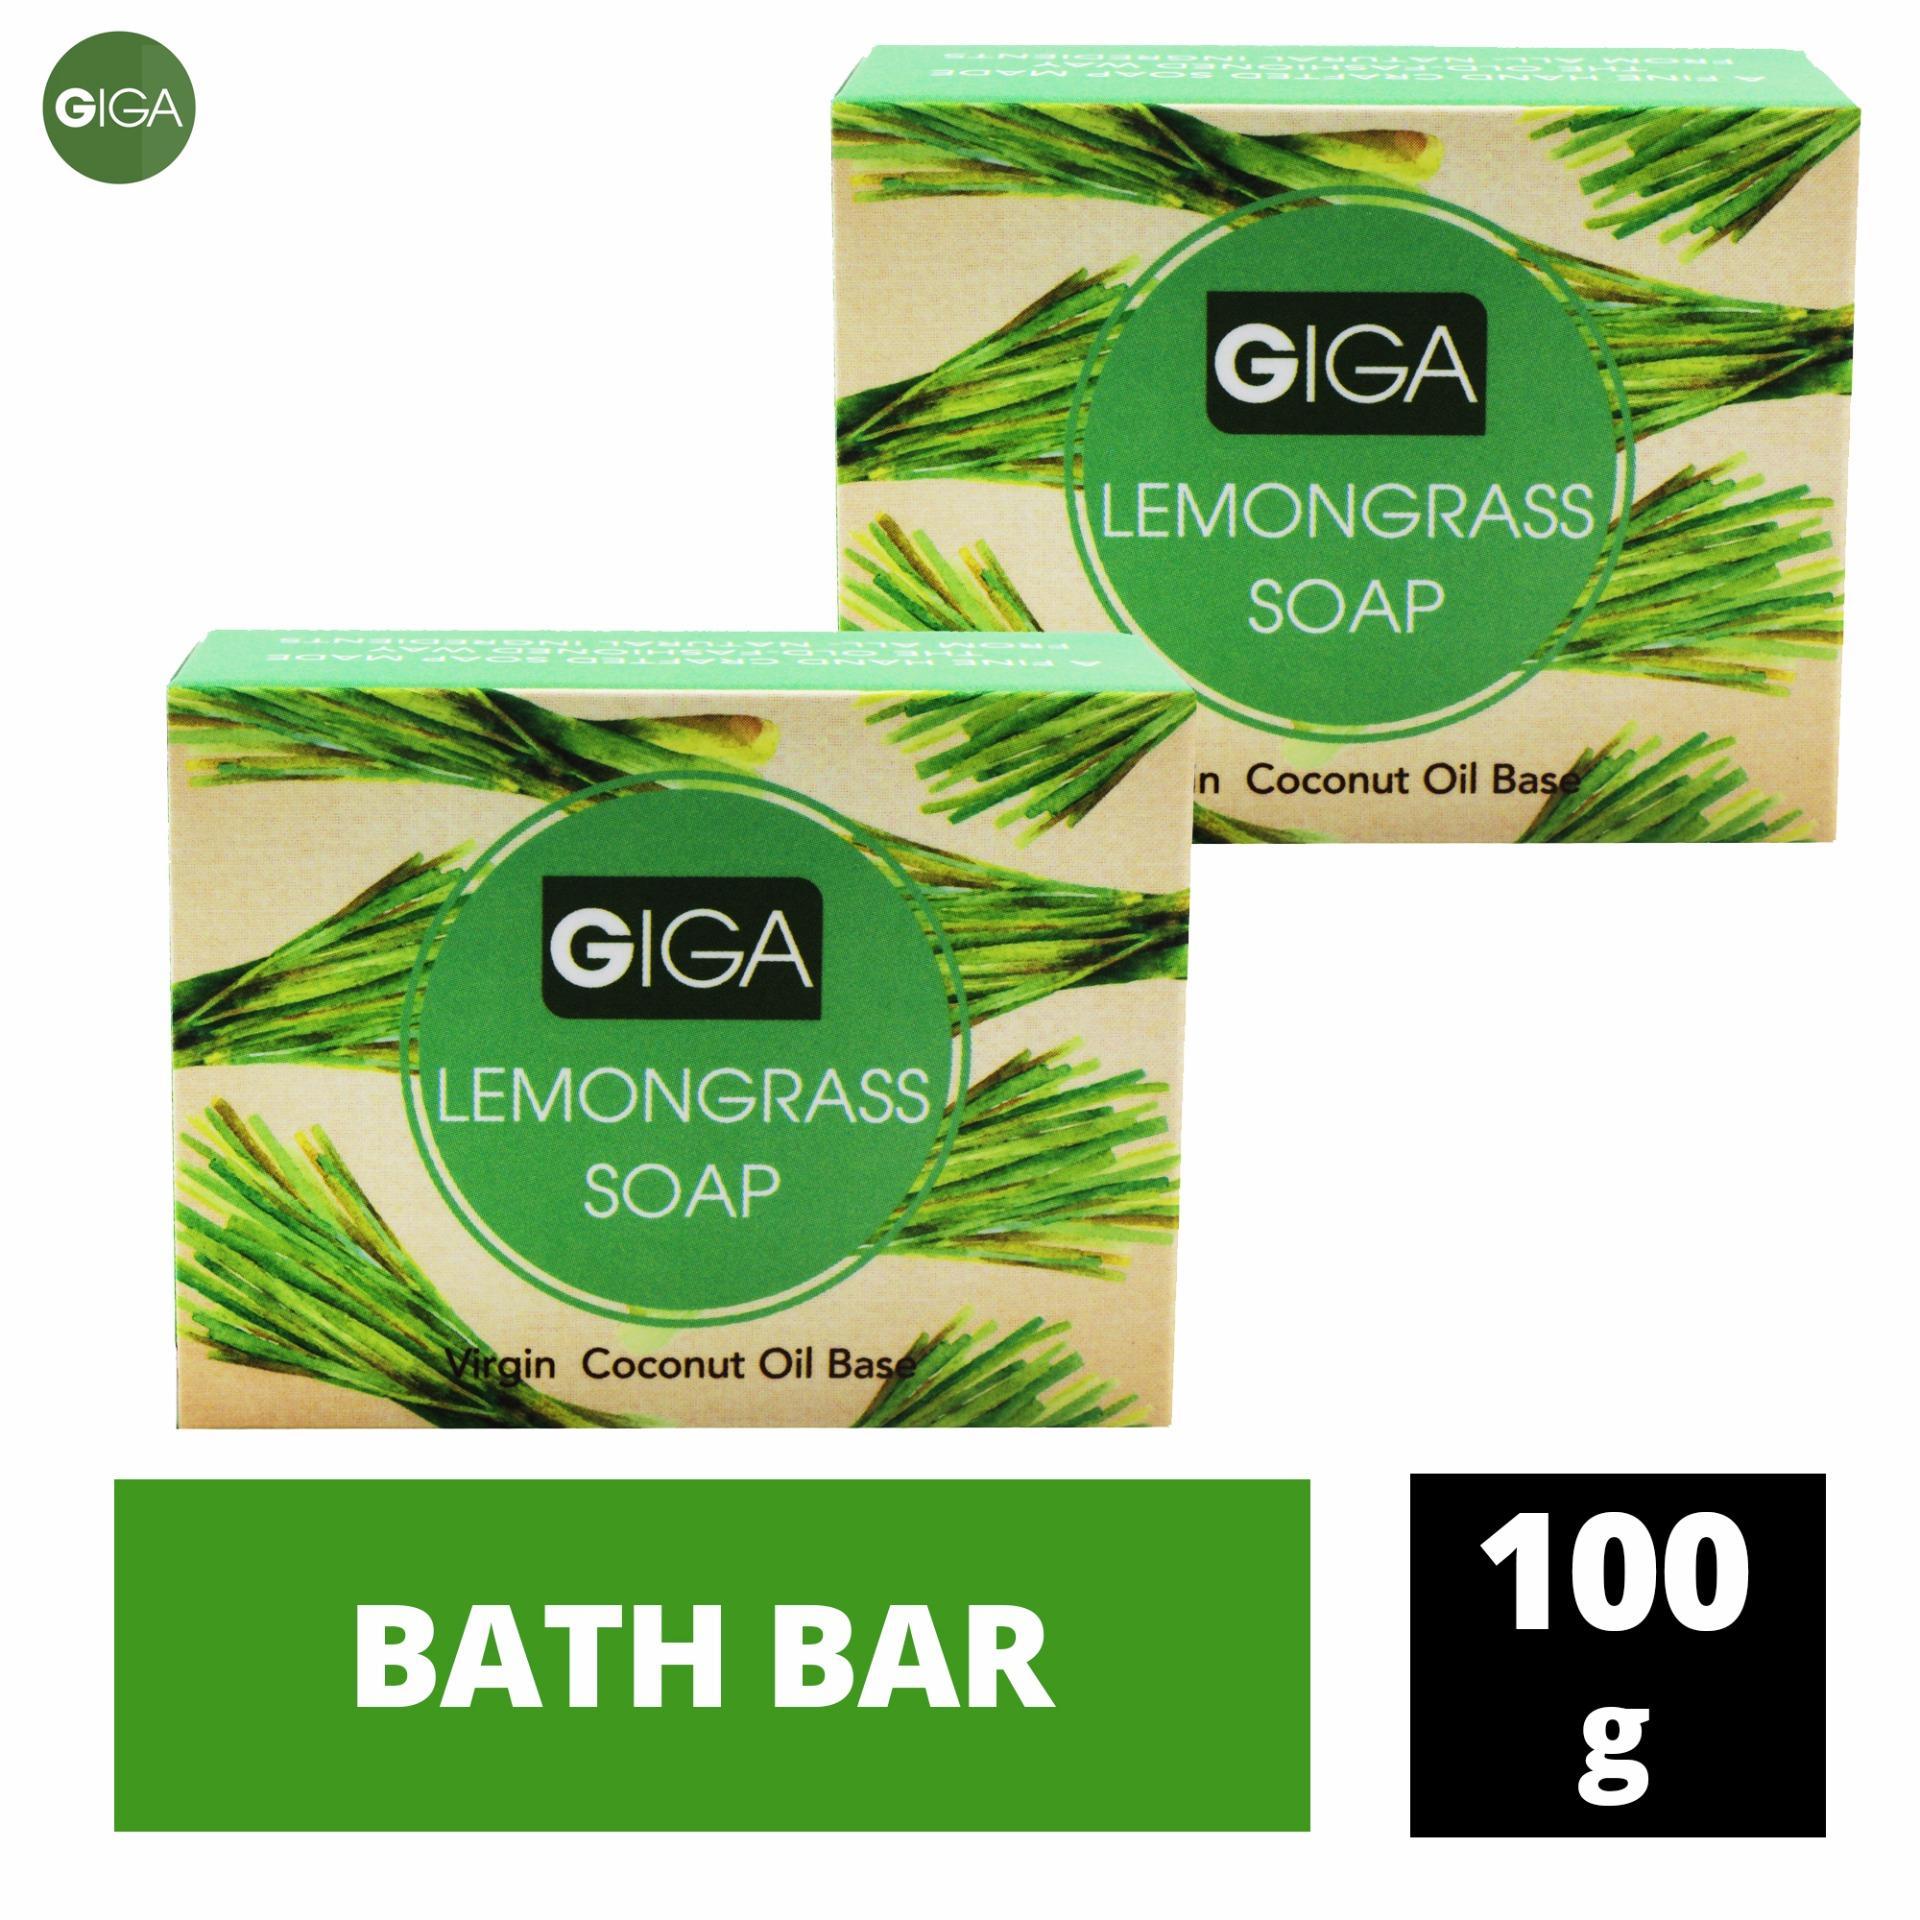 Giga Natural's Spa Lemongrass Soap 100g Set of 2